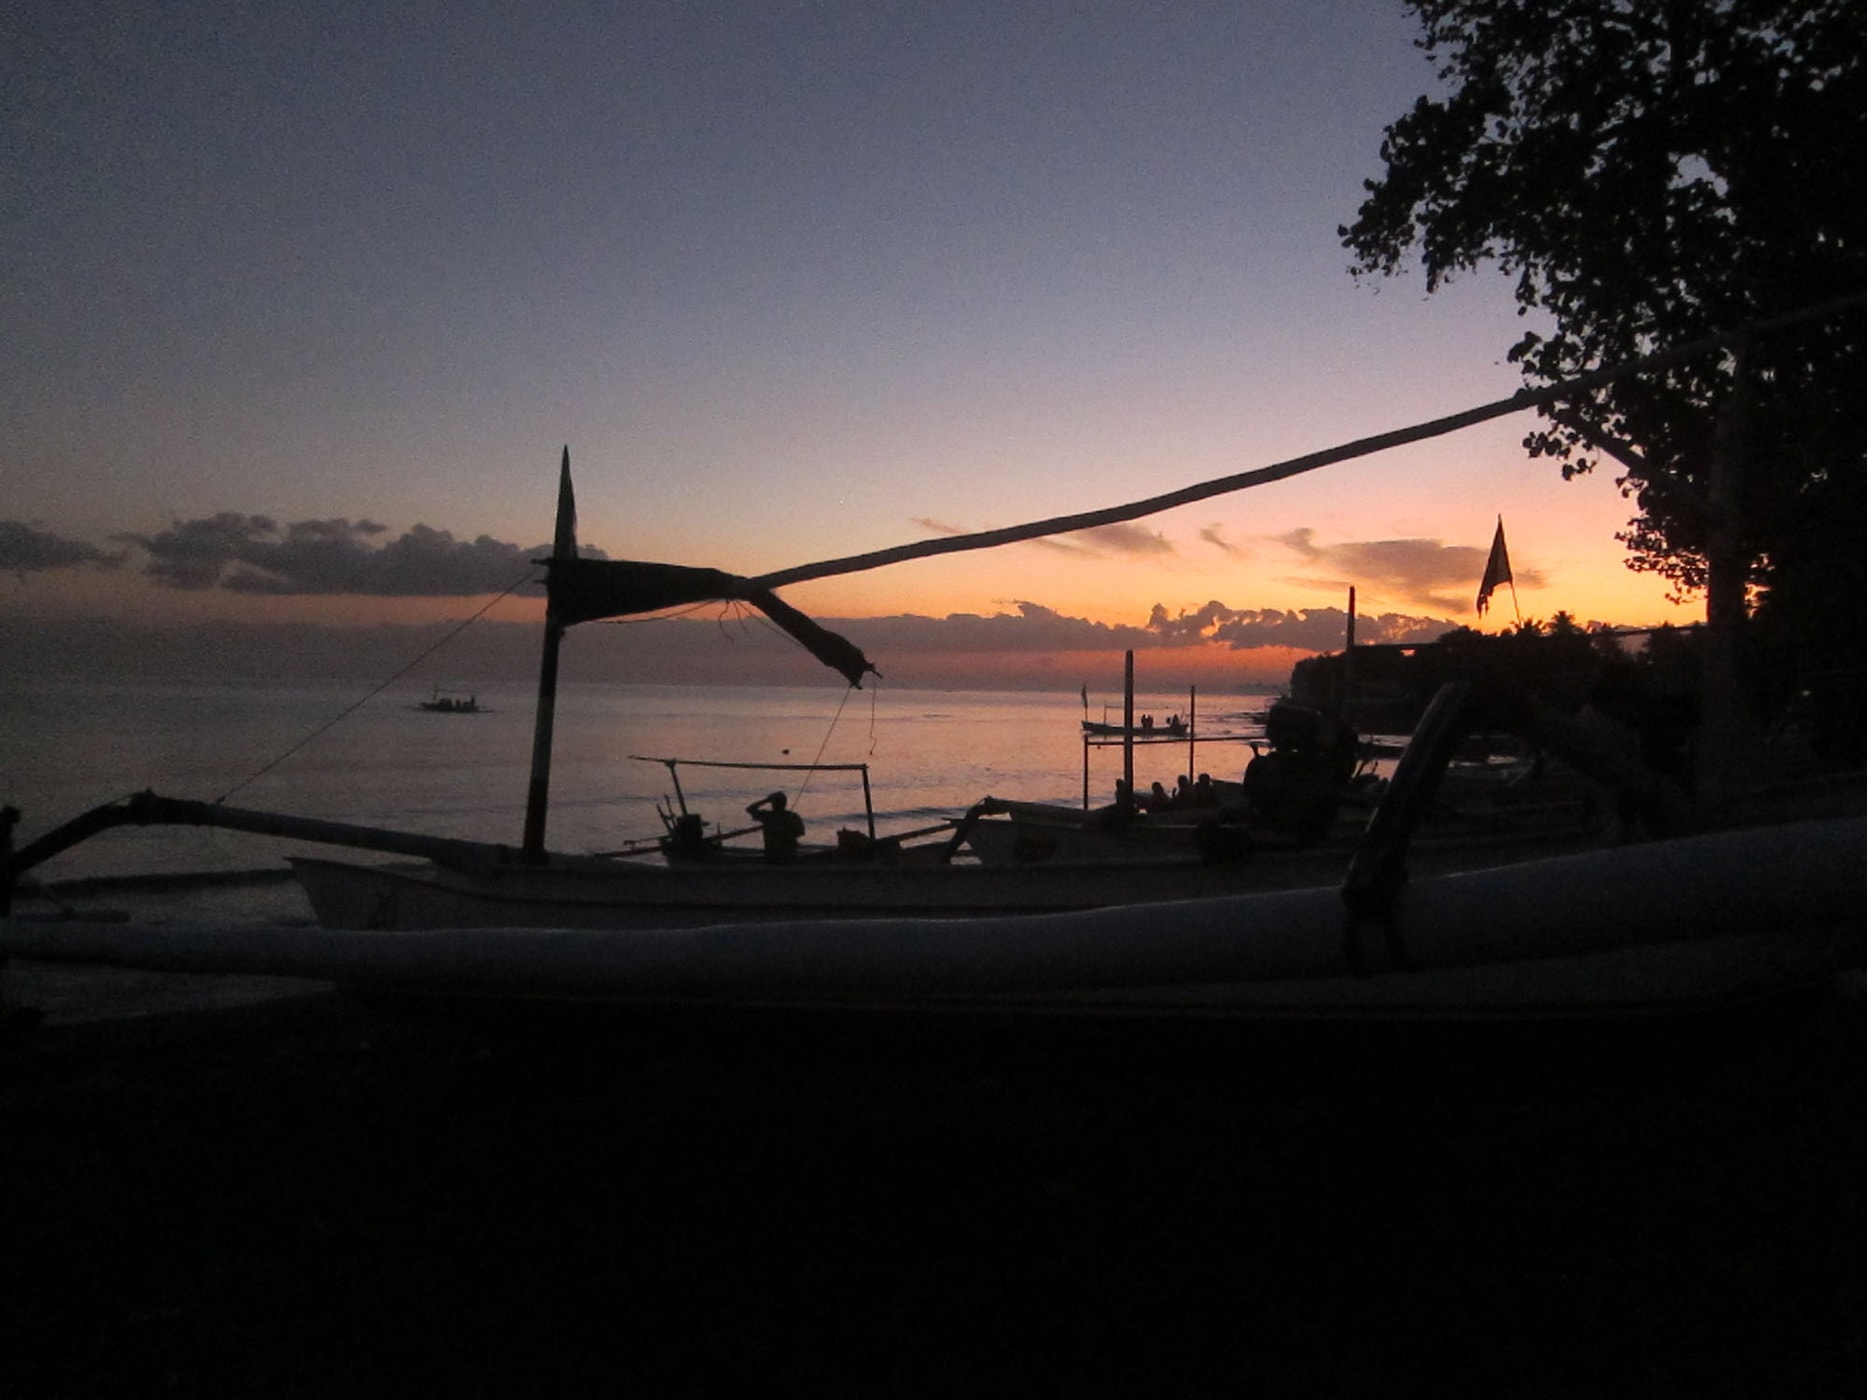 Dolphin watching in Lovina, Bali, Indonesia